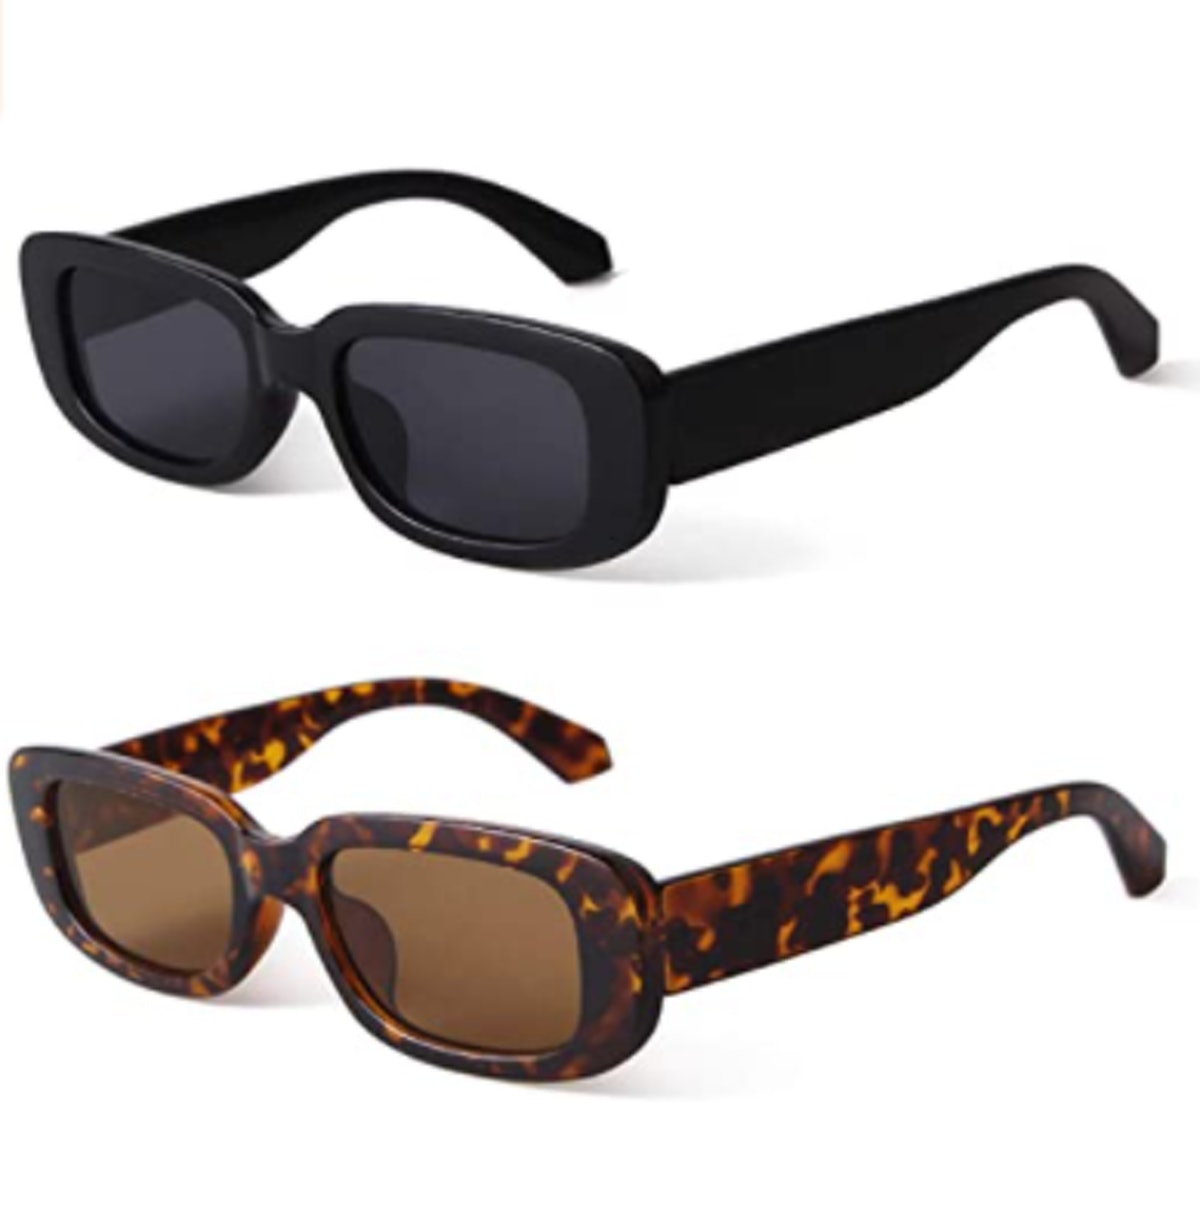 BUTABY Vintage Rectangle Sunglasses